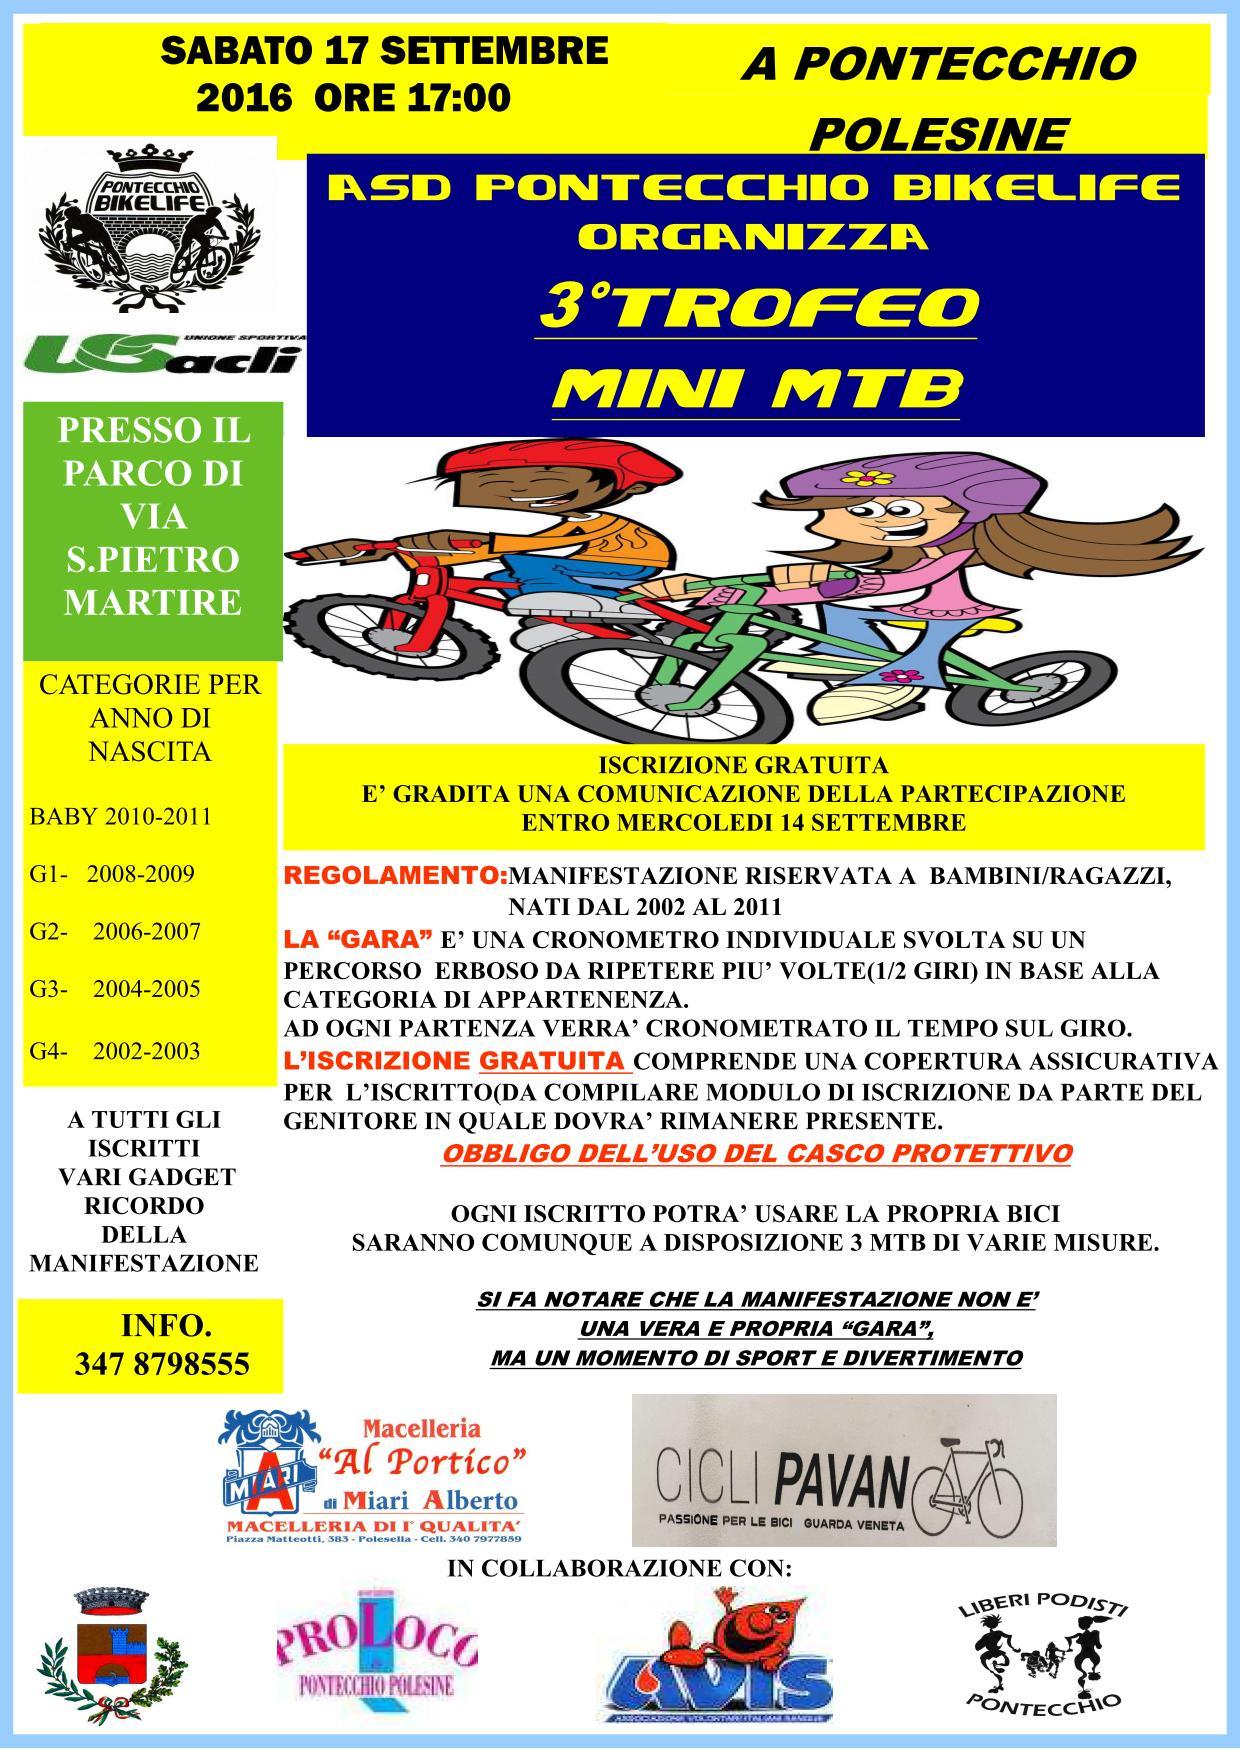 raduno pontecchio minimtb 17-09-2016